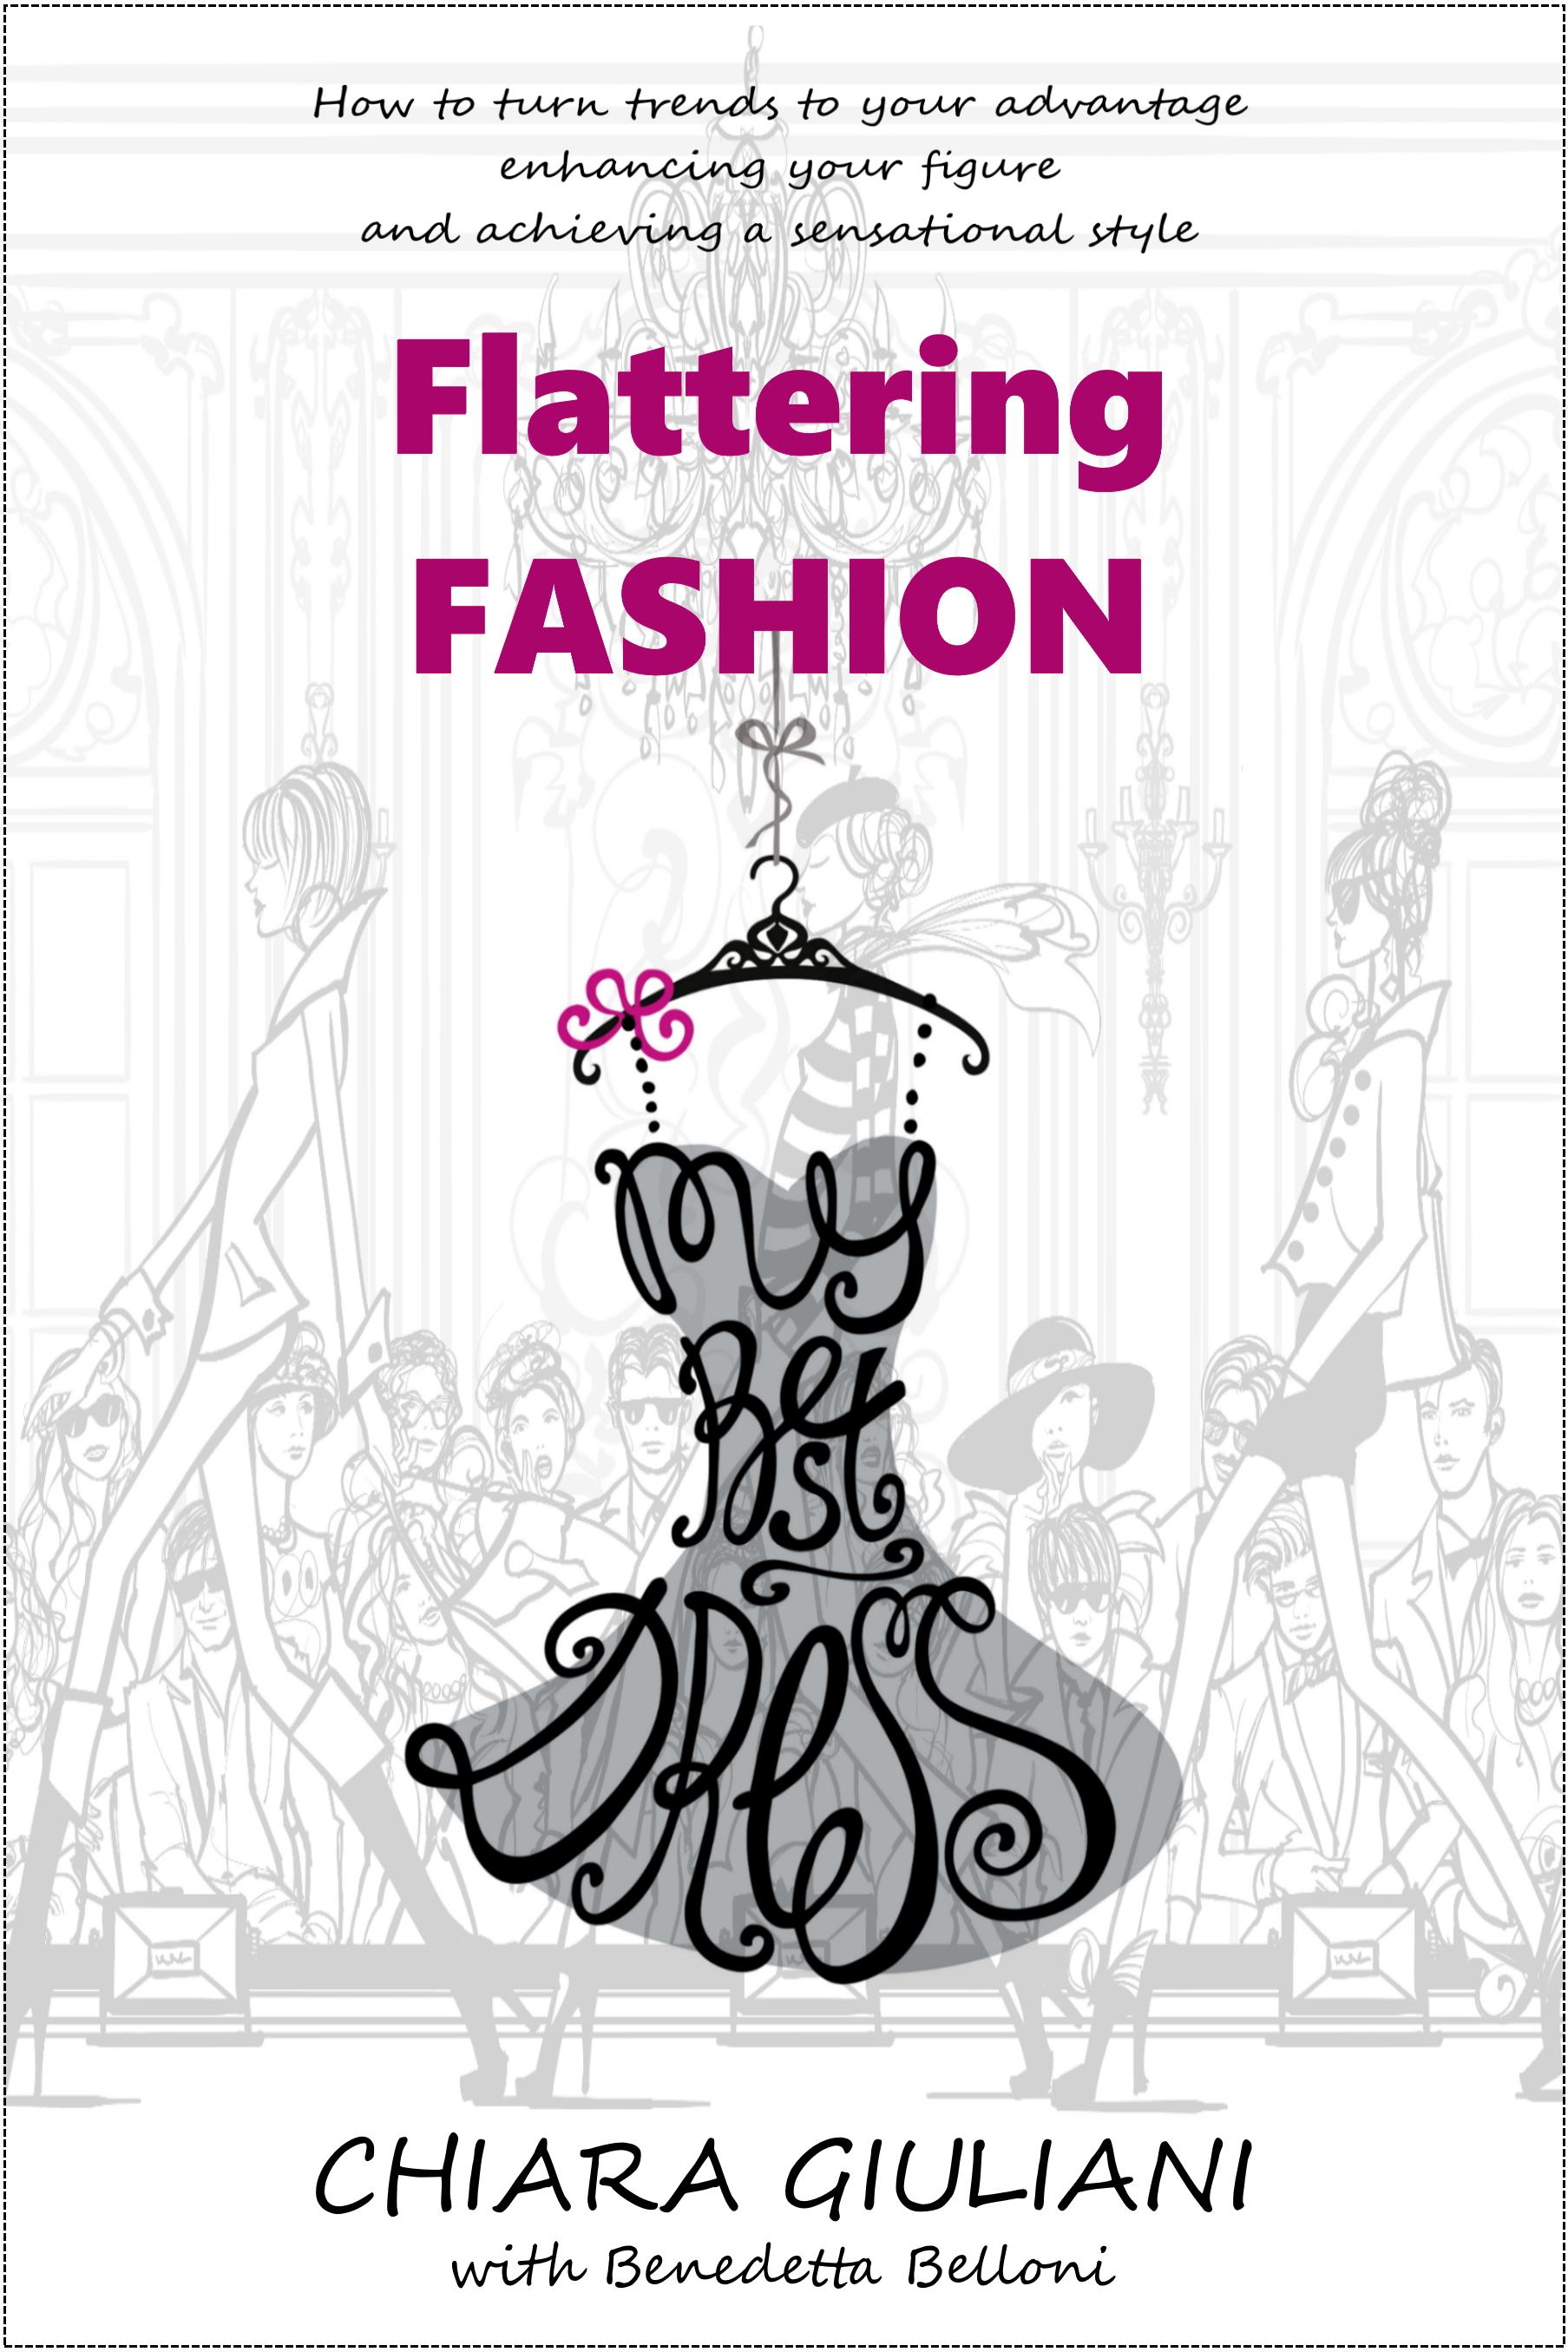 My newest book: Flattering Fashion